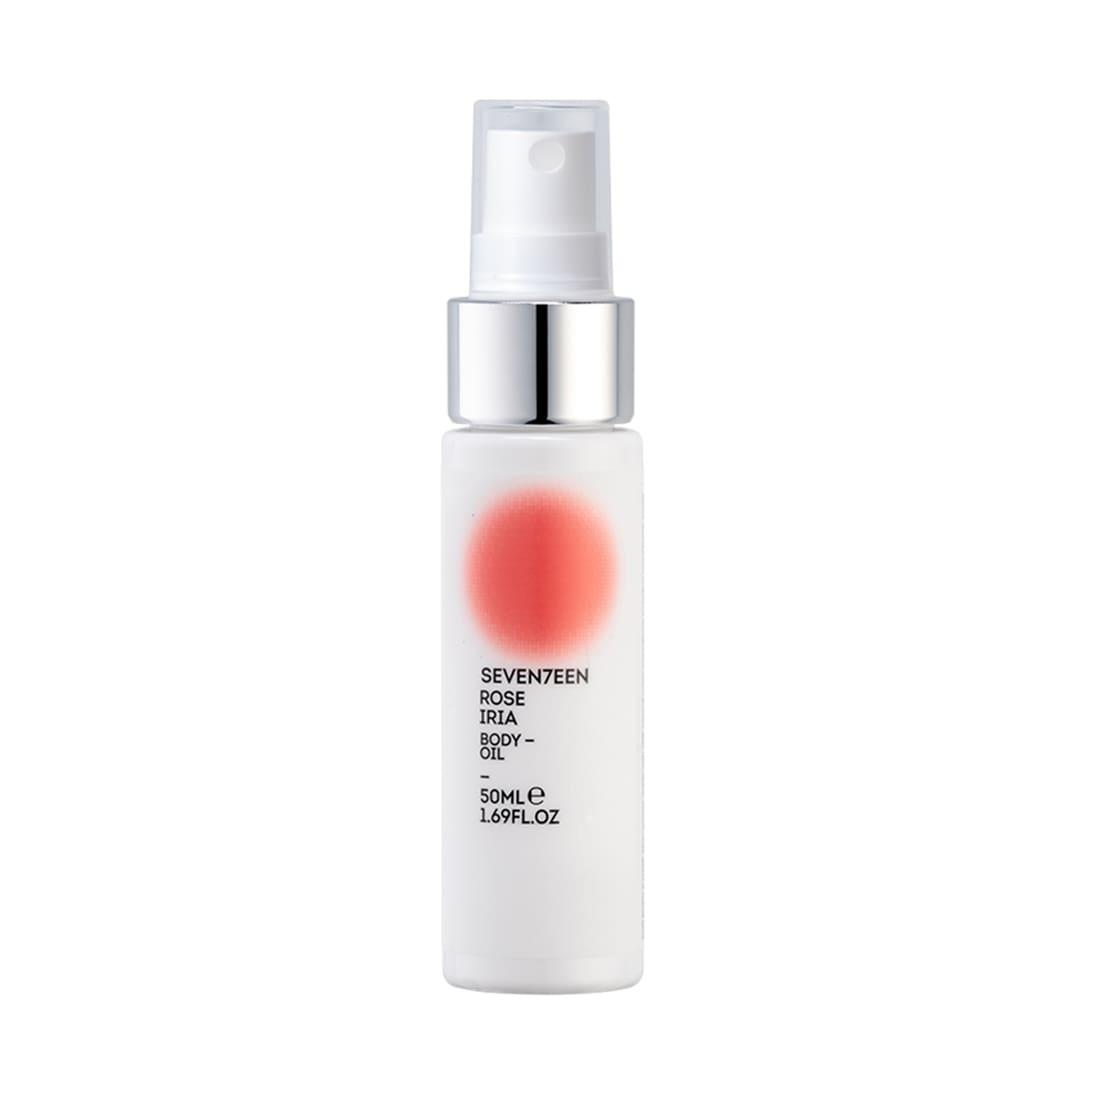 Rose Iria Dry Body Oil 50ml